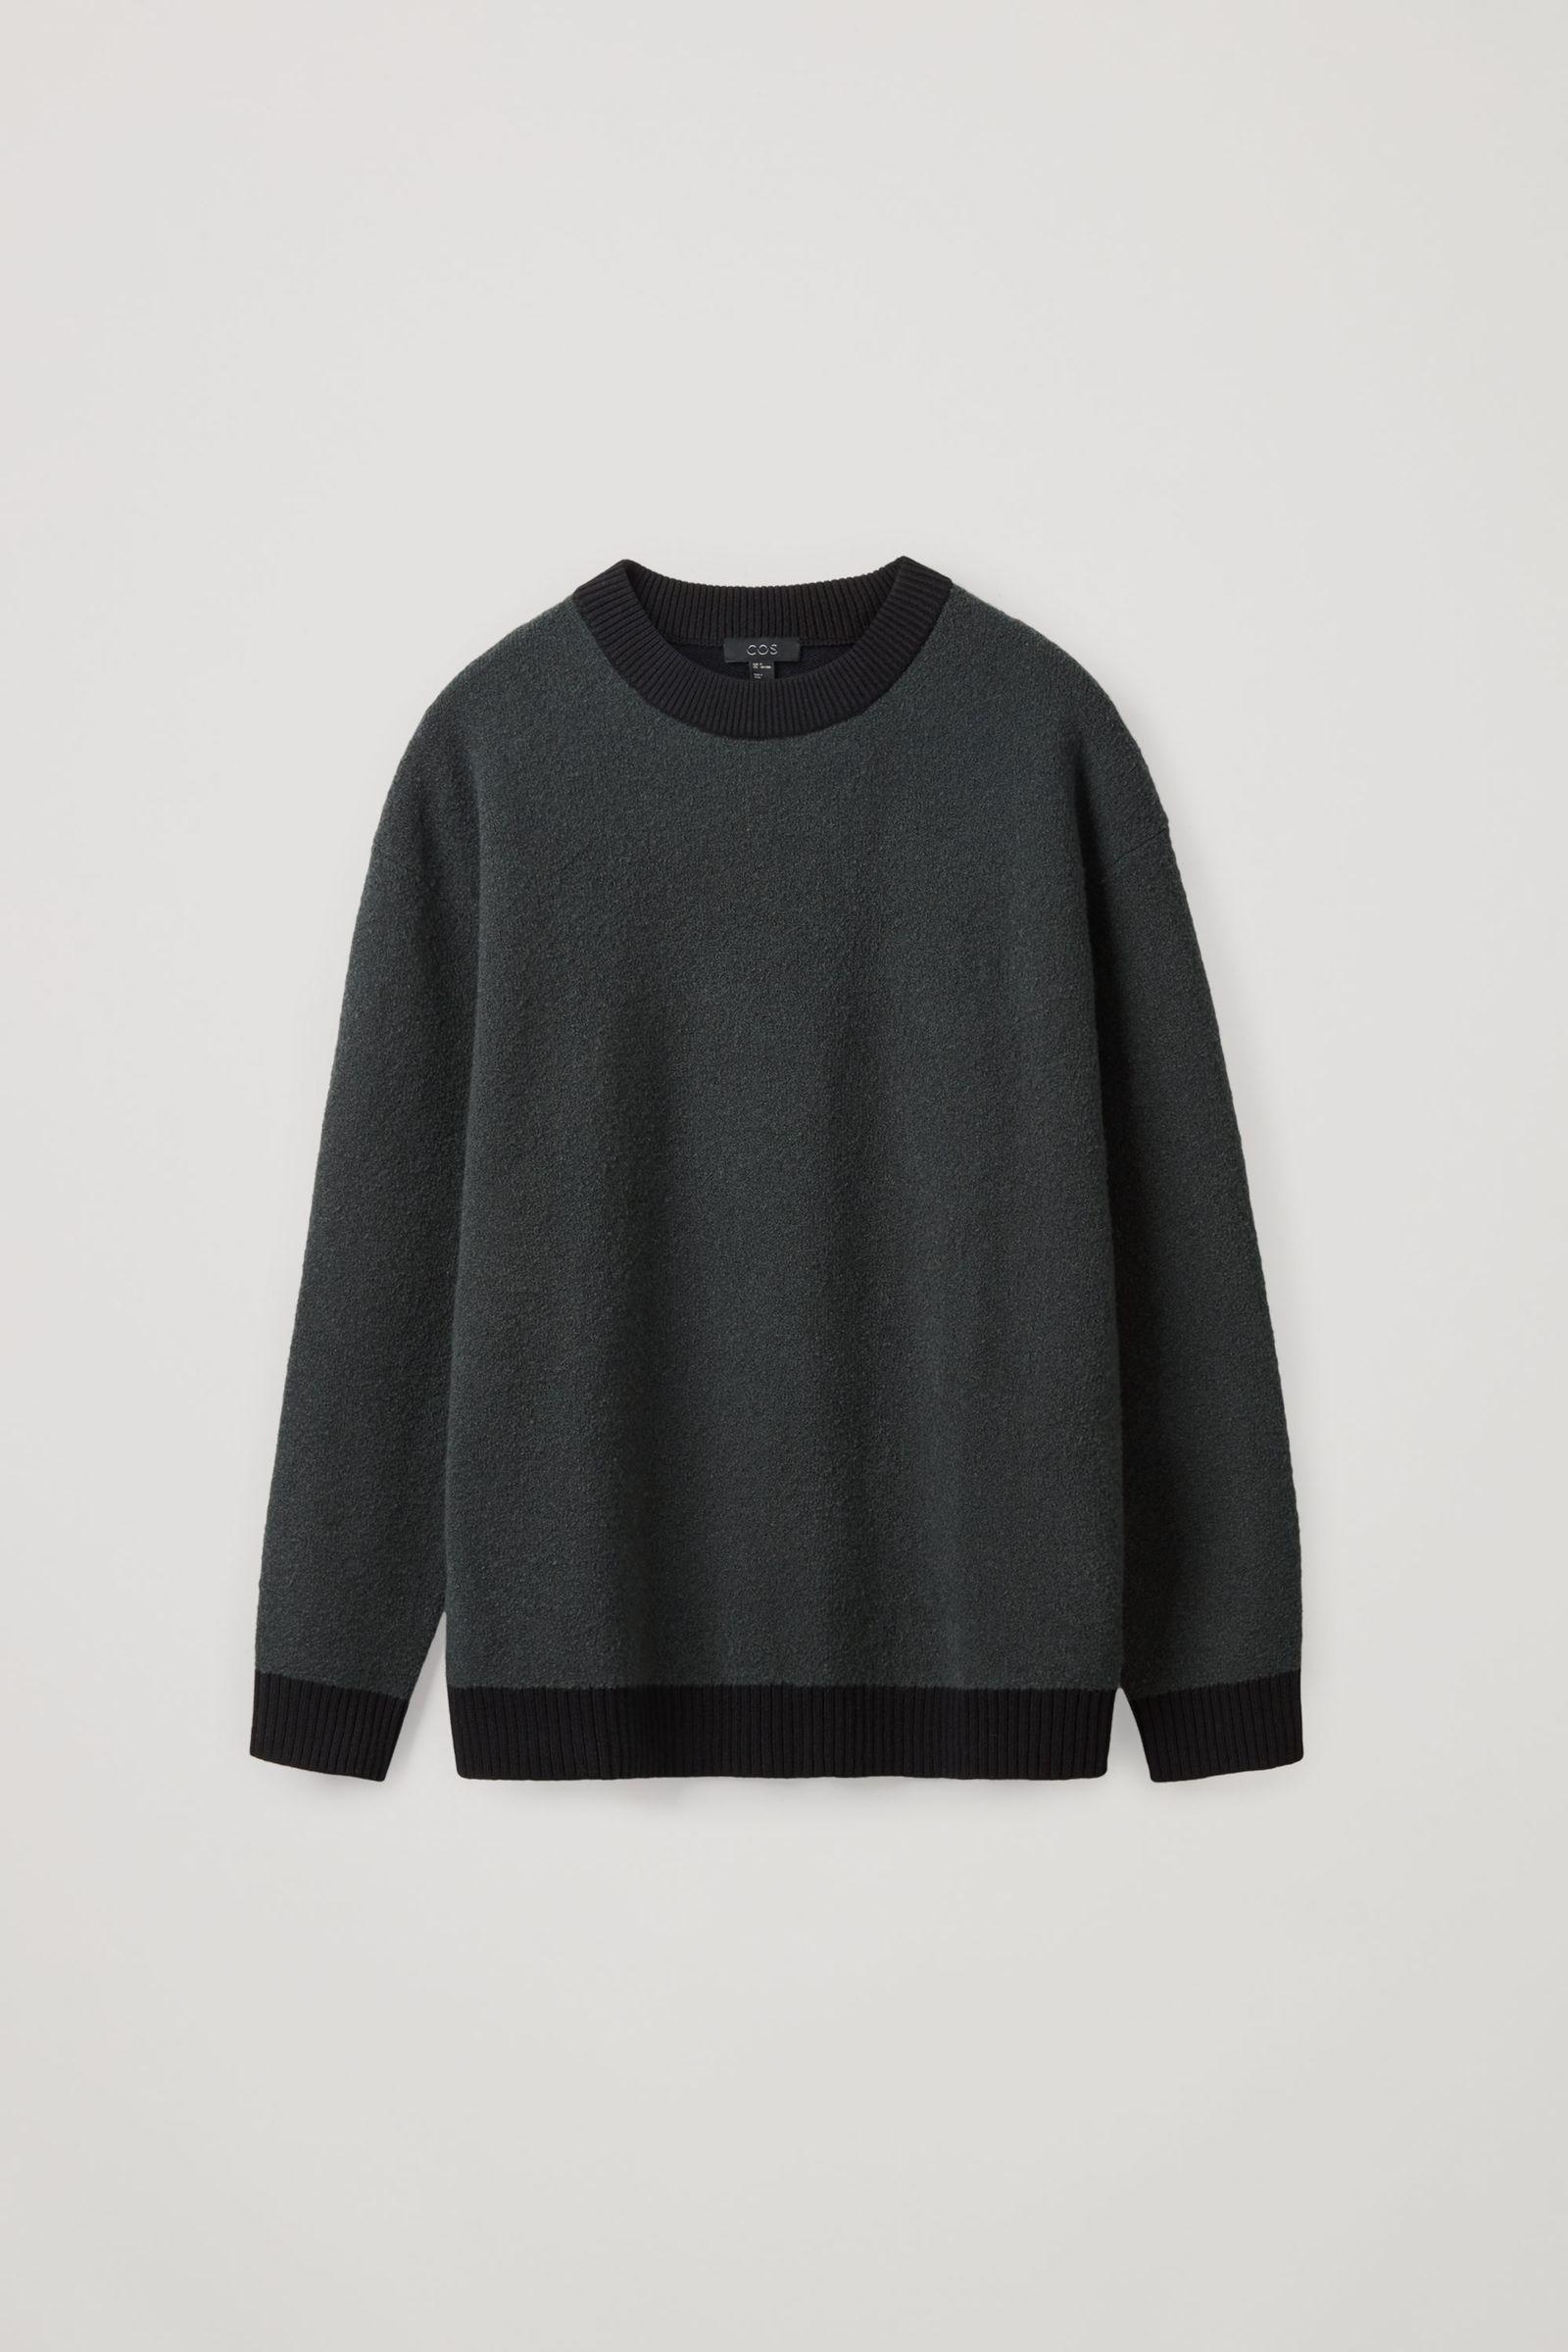 COS 울 컬러 블록 스웨터의 다크 그레이 / 블랙컬러 Product입니다.